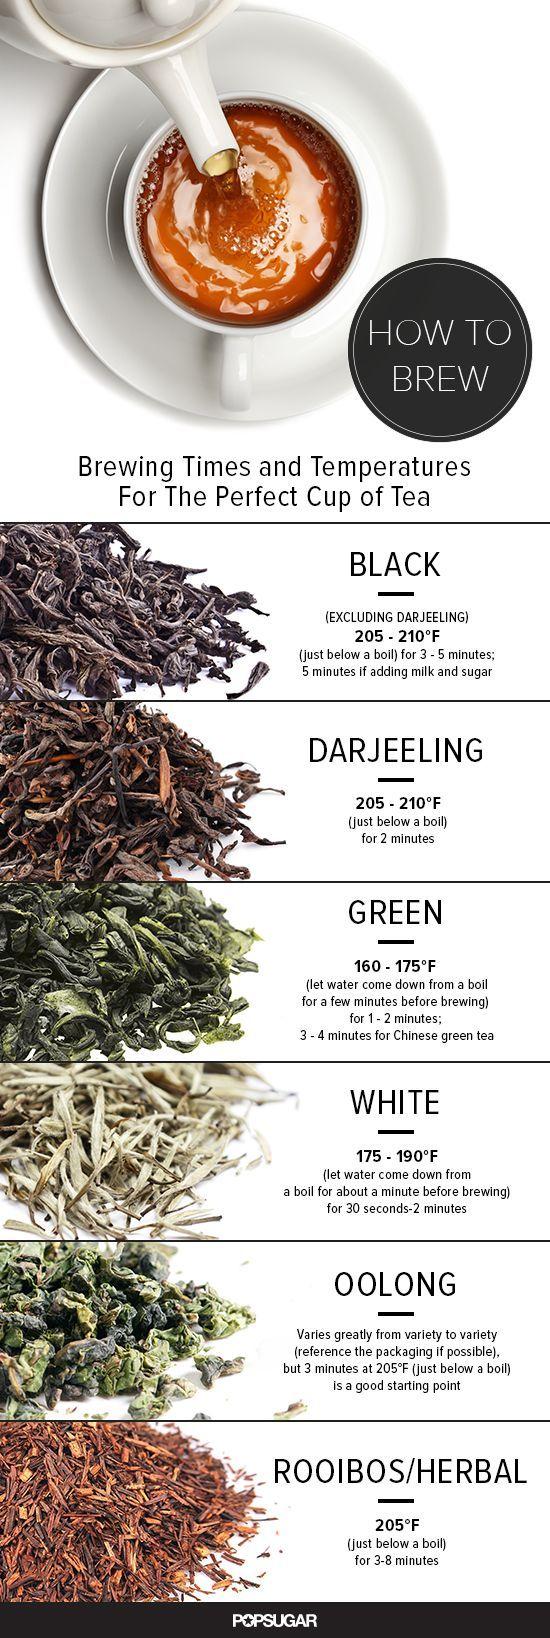 Learn how to brew tea like